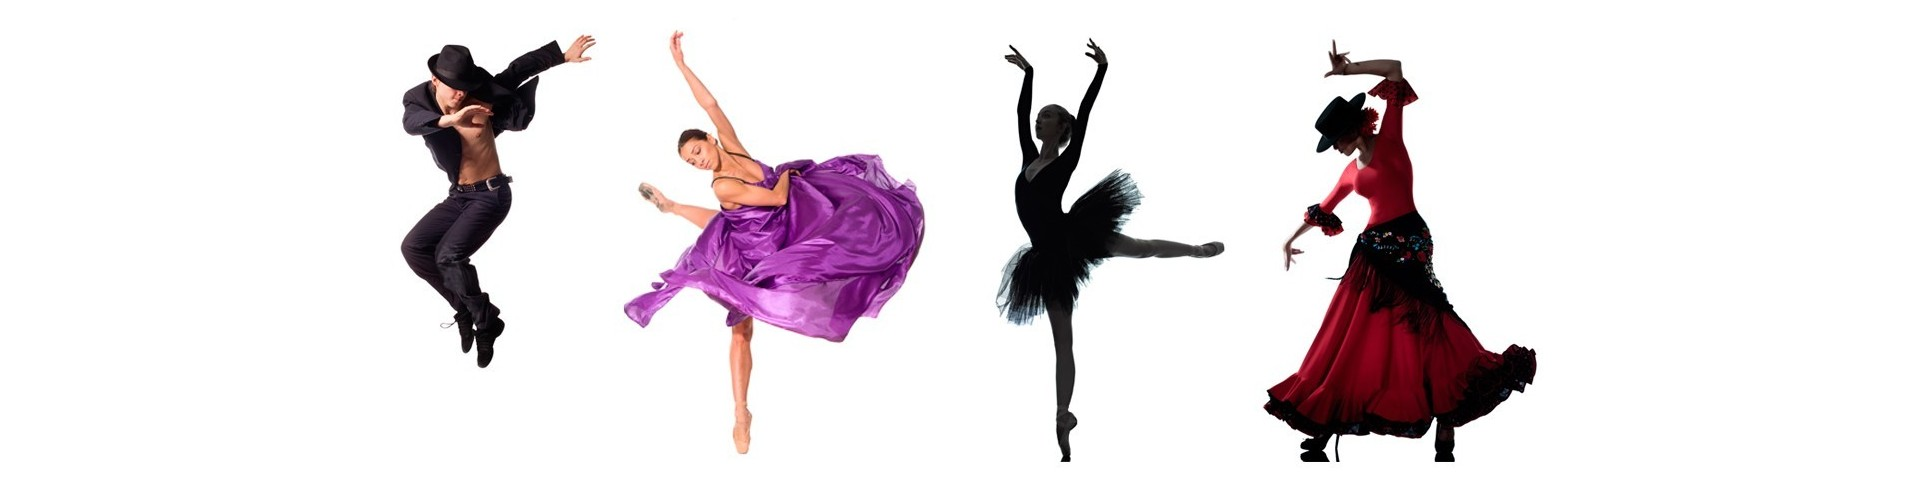 Disciplines - Les Danses